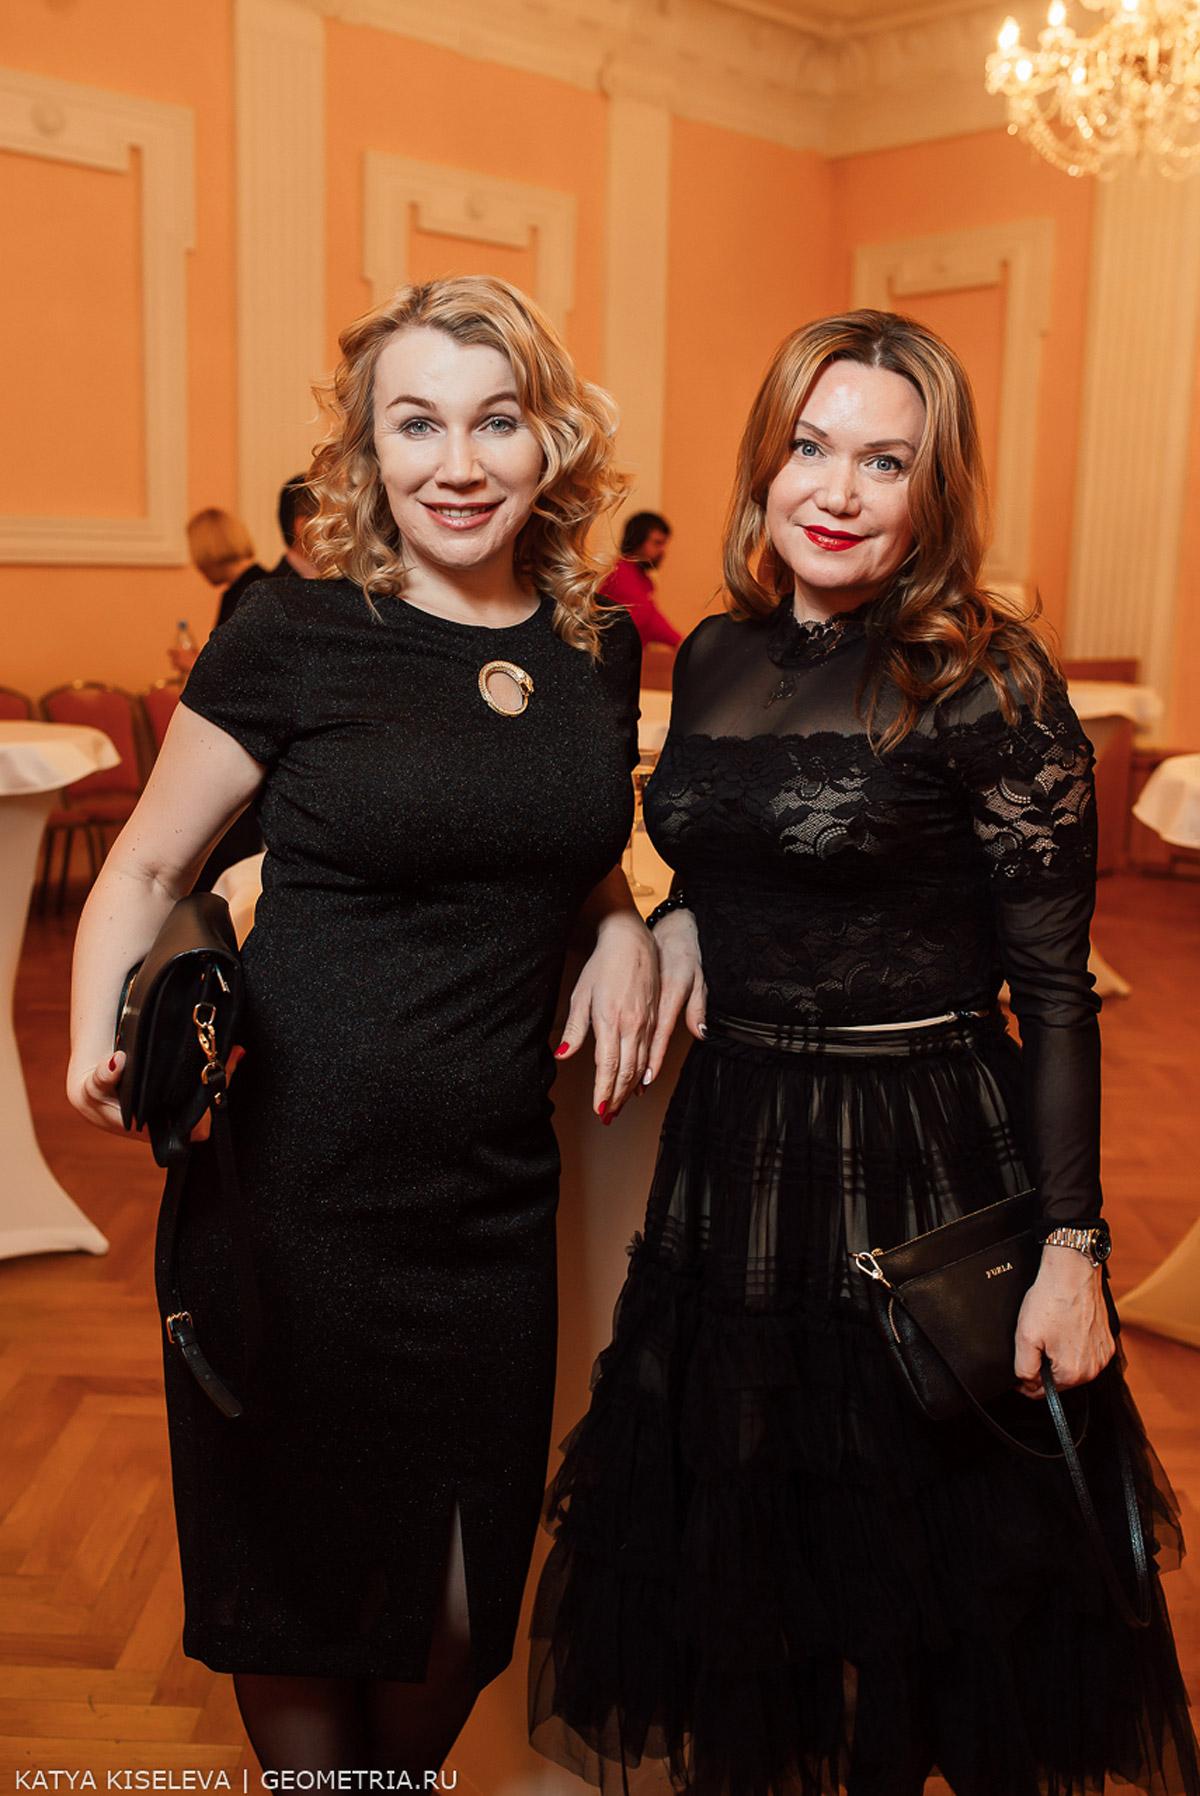 085_2018-02-14_19-08-59_Kiseleva.jpg